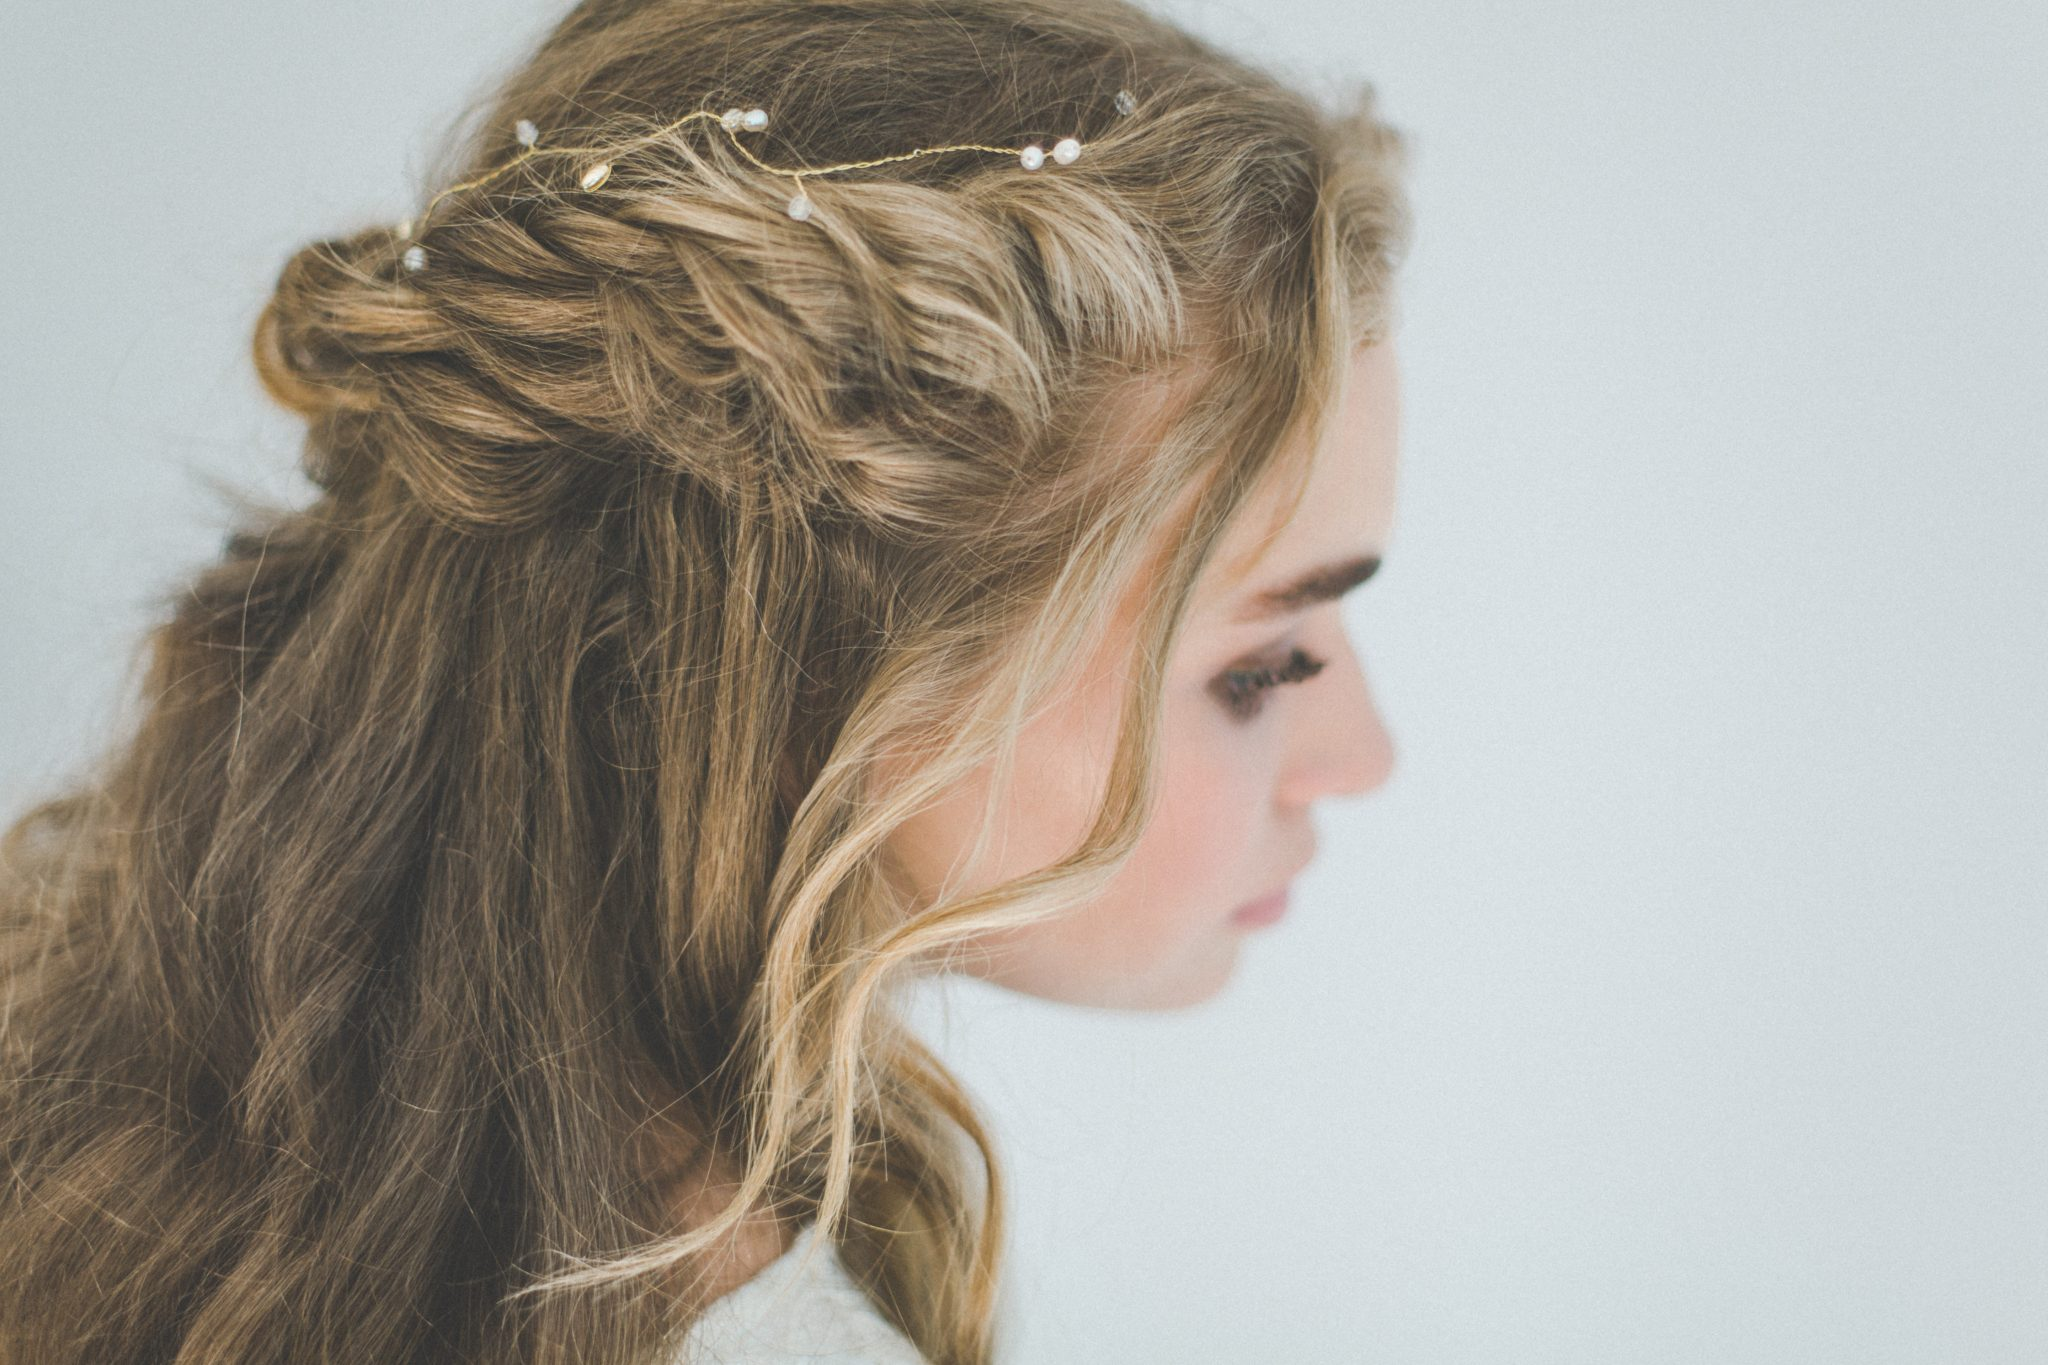 sara_hair_make-up_muenchen_zuzanna_grabias_hajsajs_3